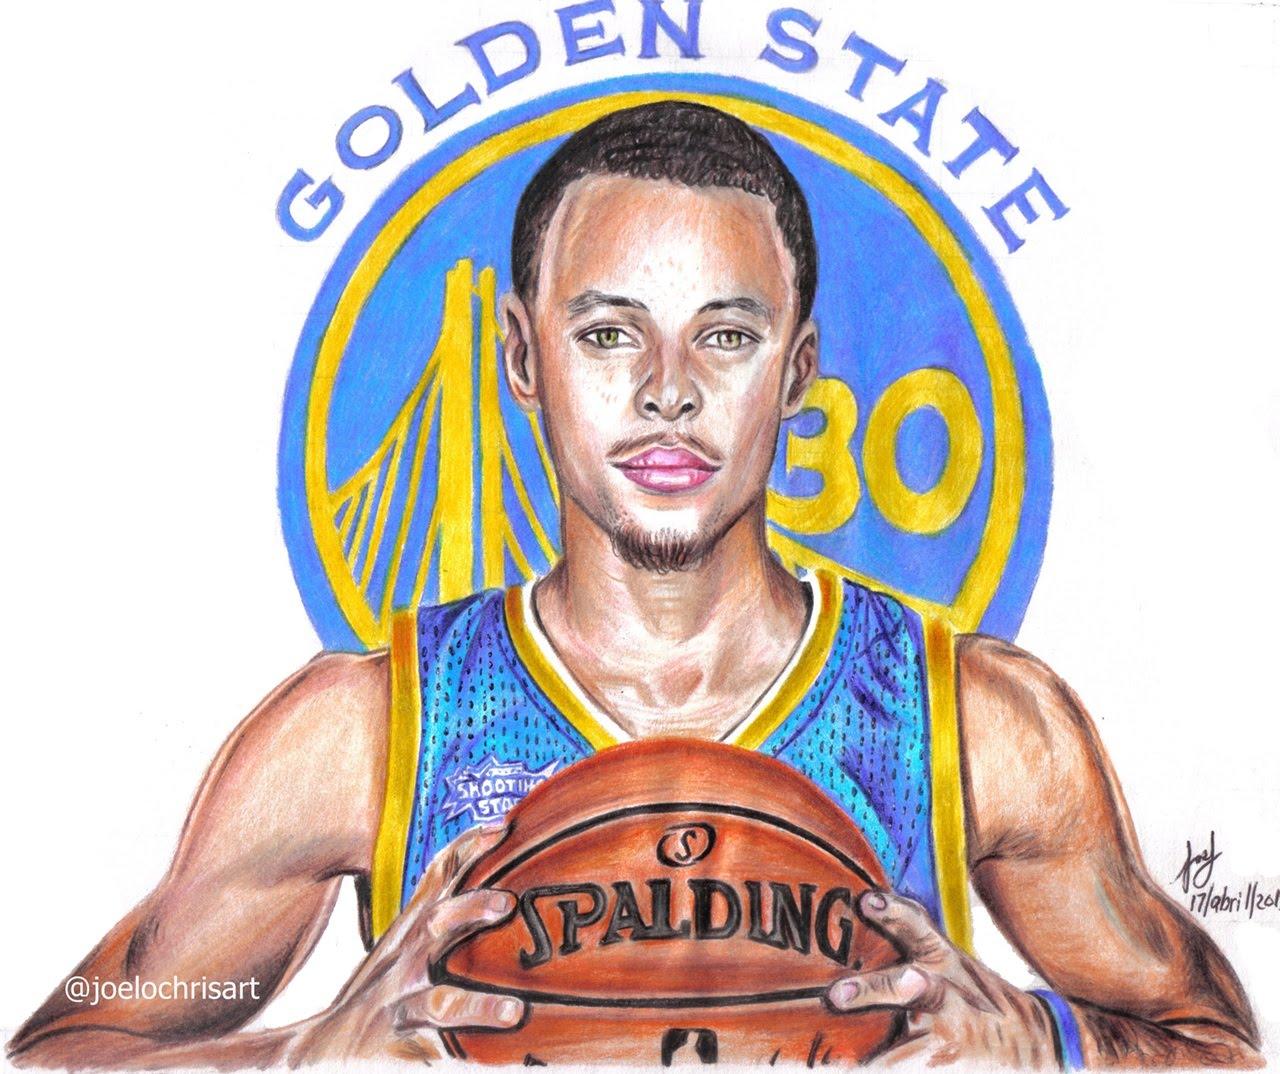 1280x1074 Drawing Stephen Curry Mvp 2015 And 2016 Nba Basketball Player